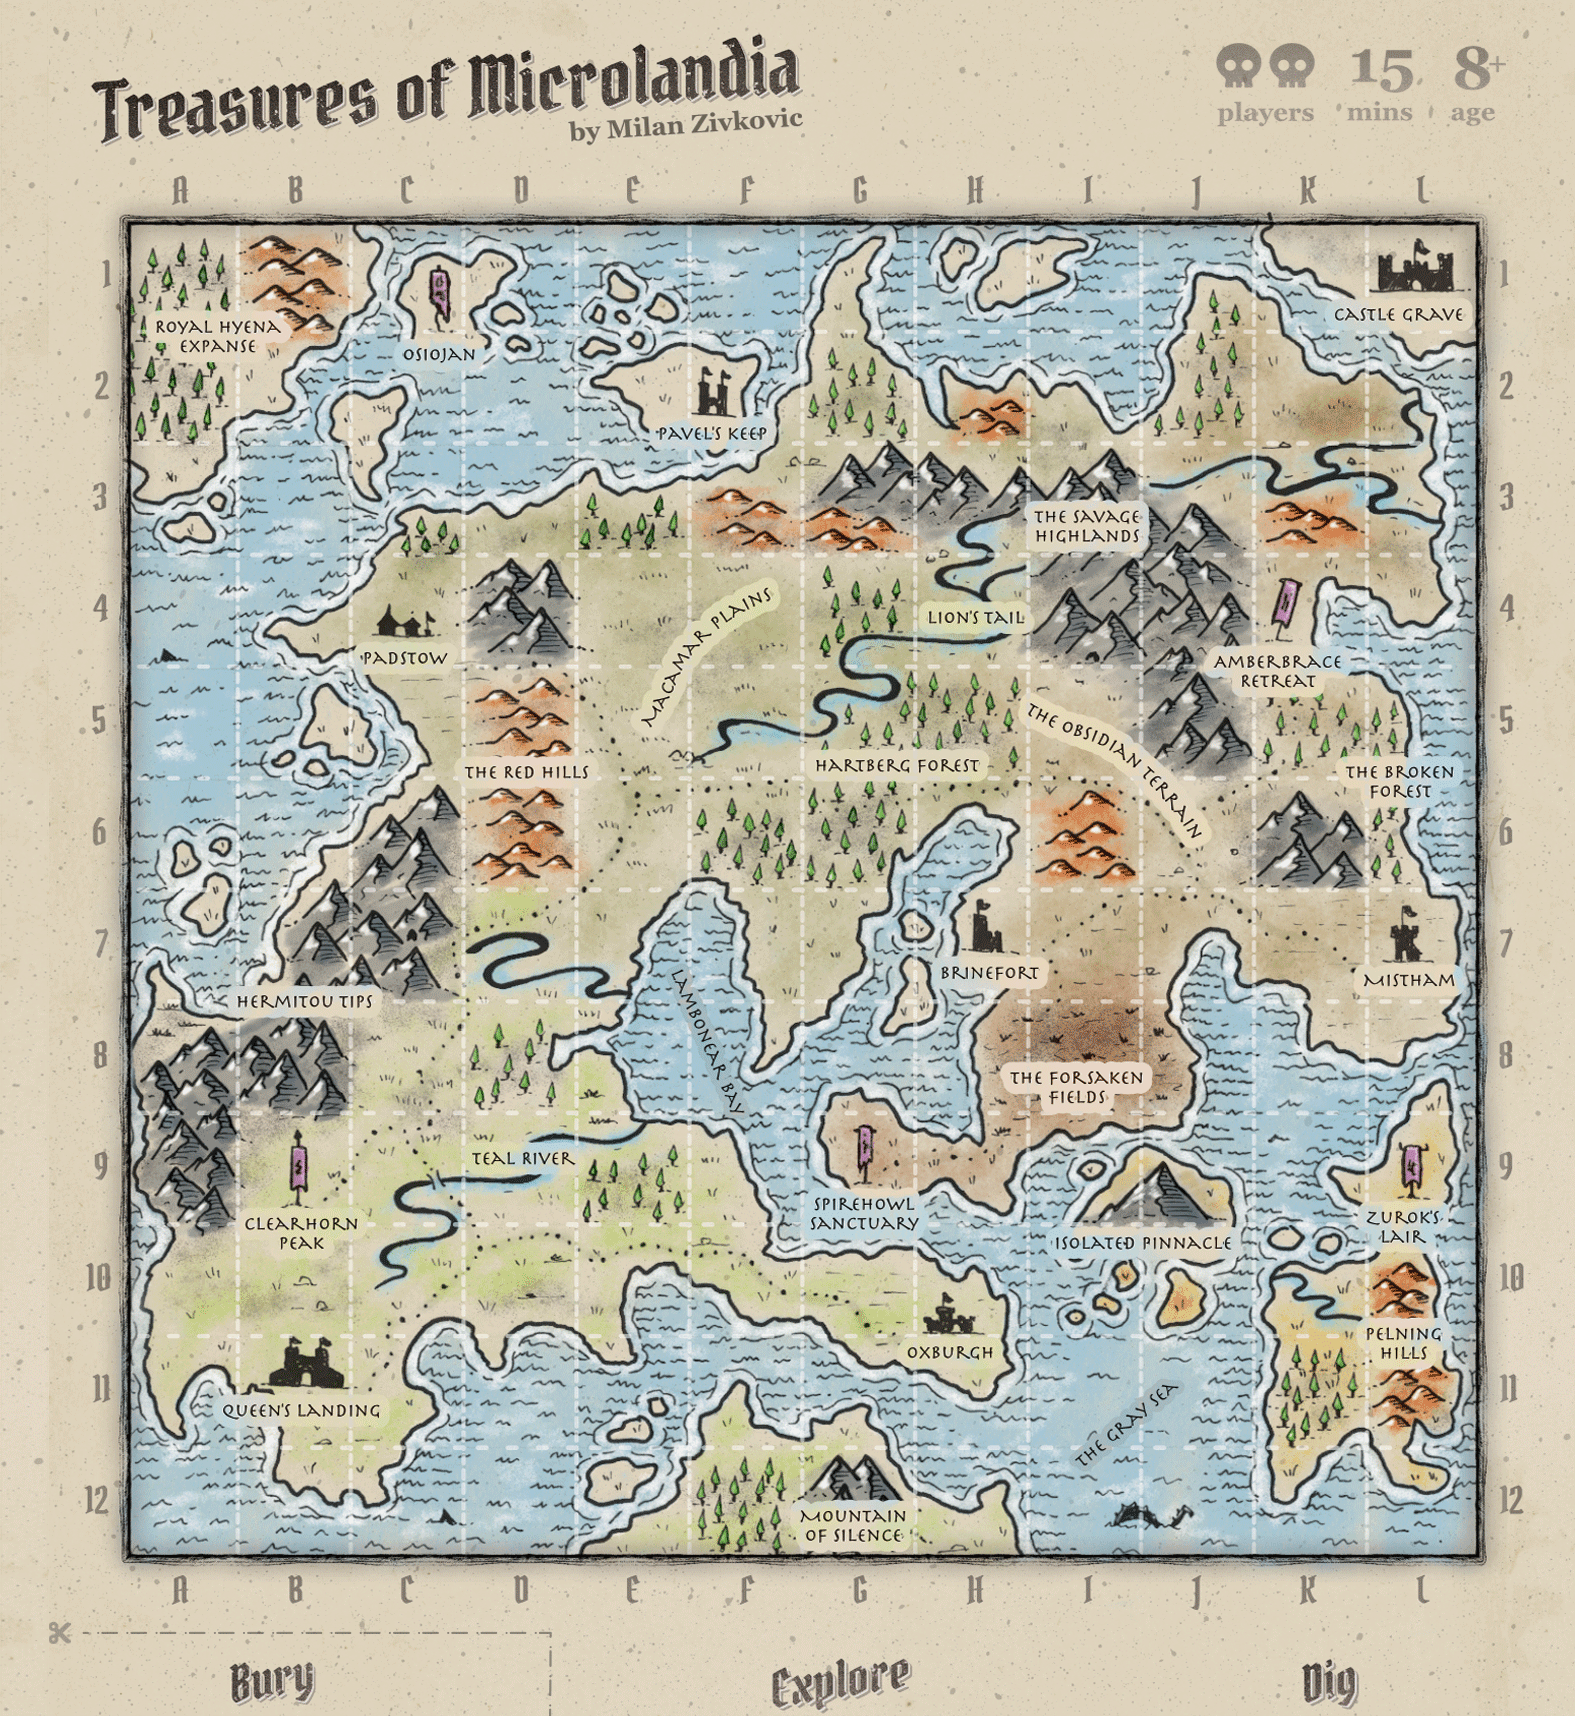 Treasures of Microlandia